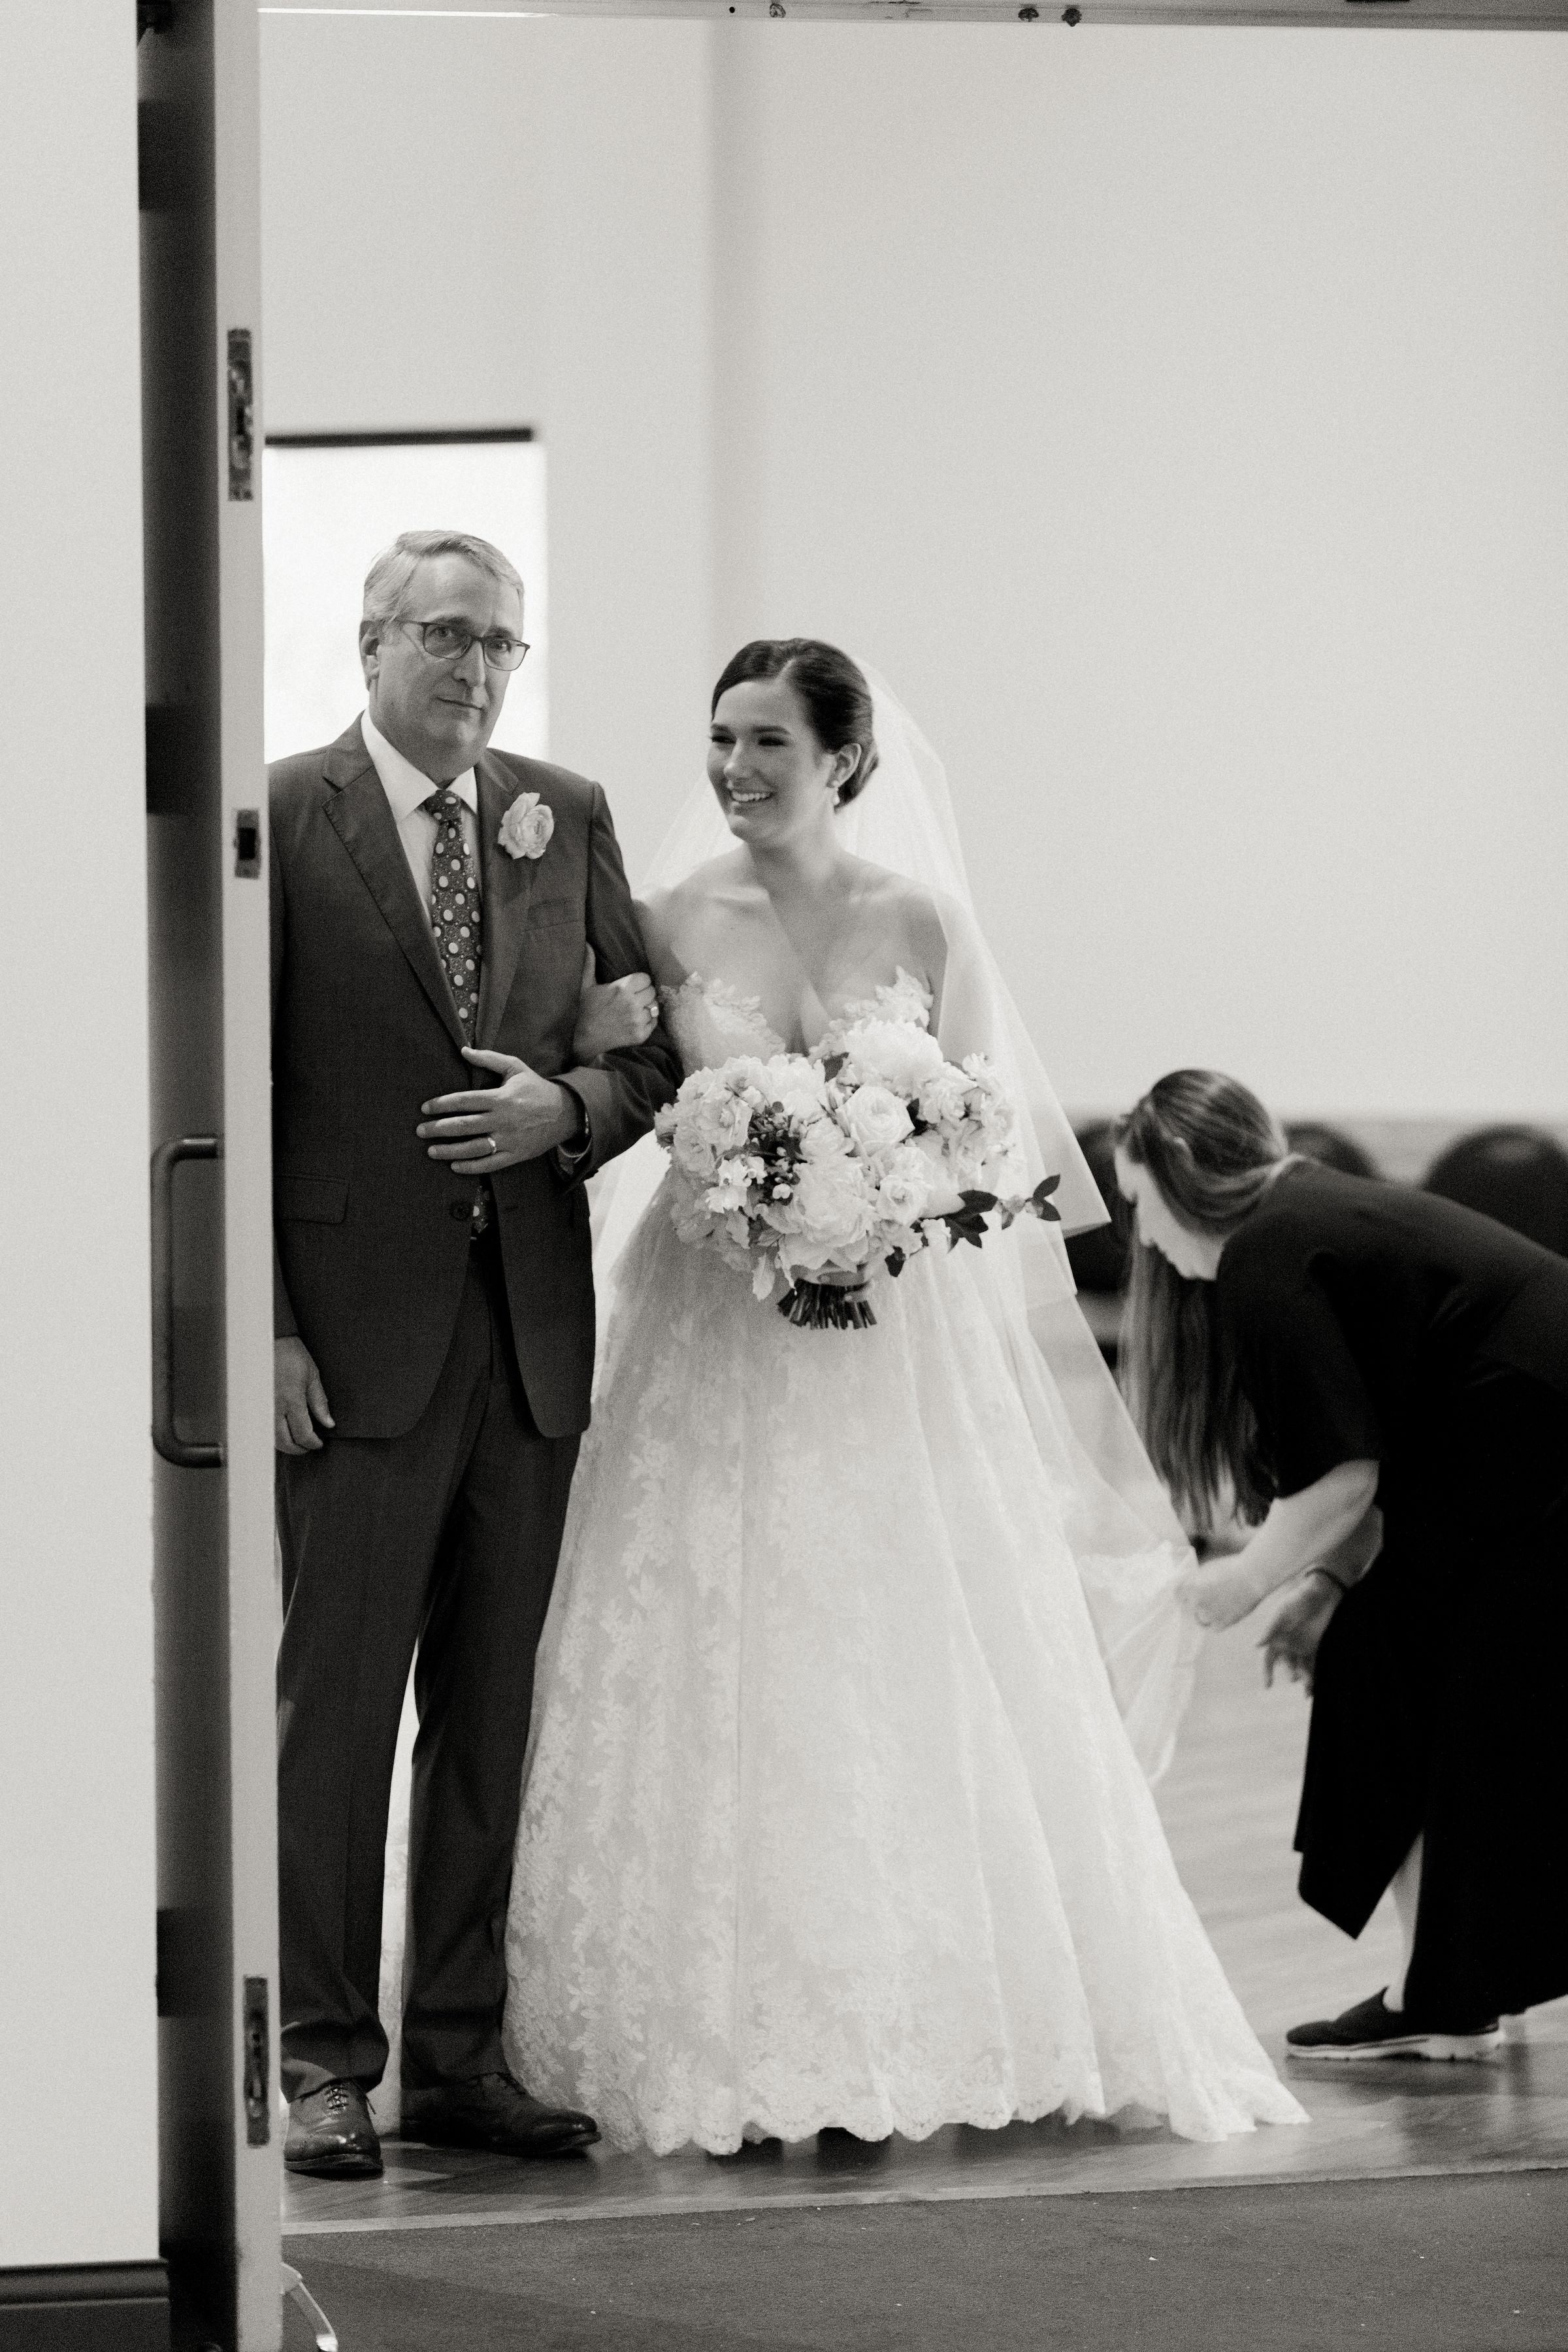 McElravey_Wedding_CarolineLimaPhotography_2018_103.jpg